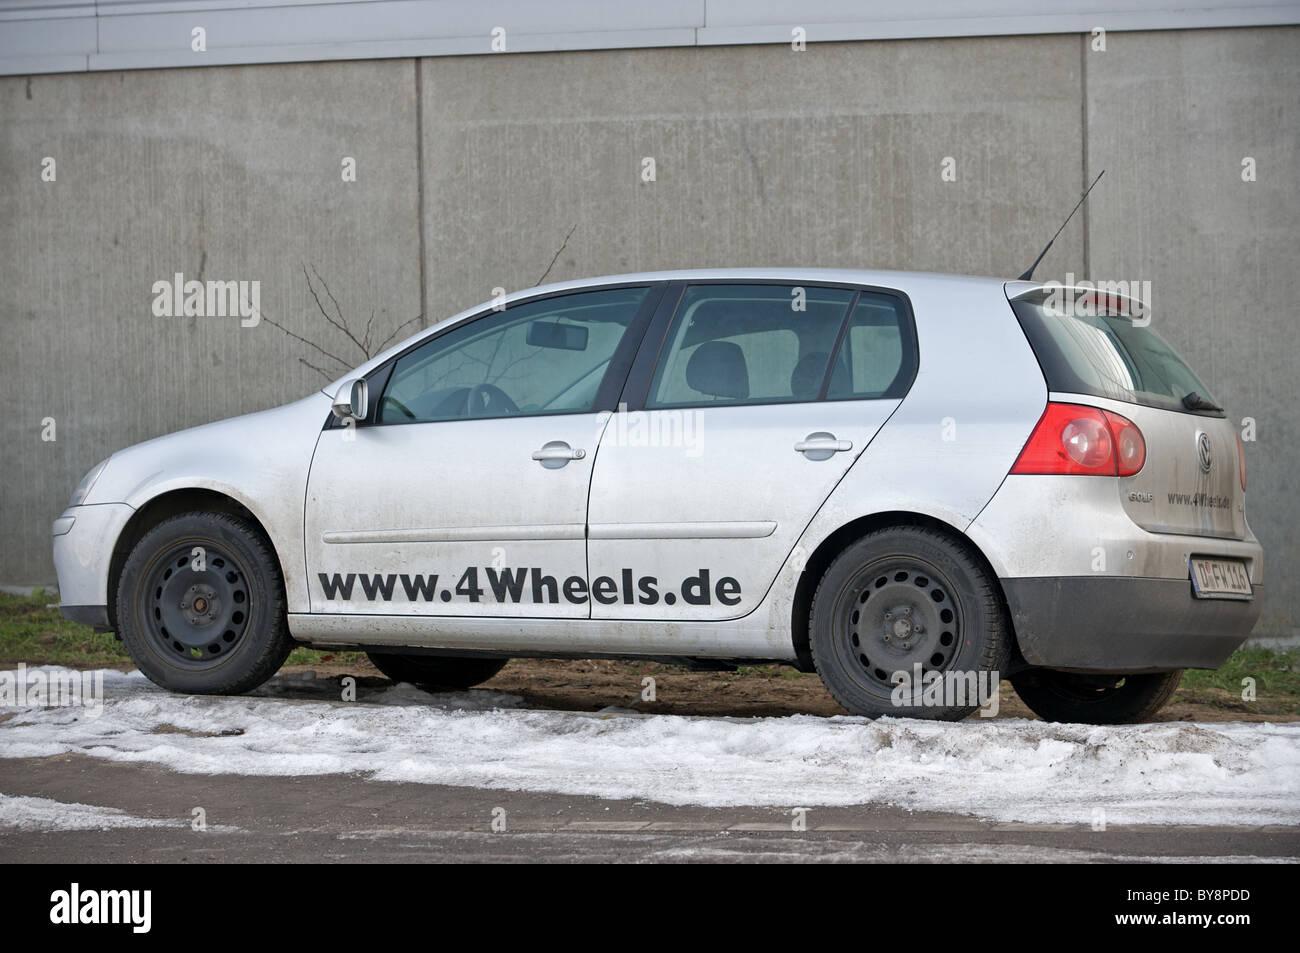 German car hire company 4Wheels.de VW Golf, Dusseldorf, Germany. - Stock Image